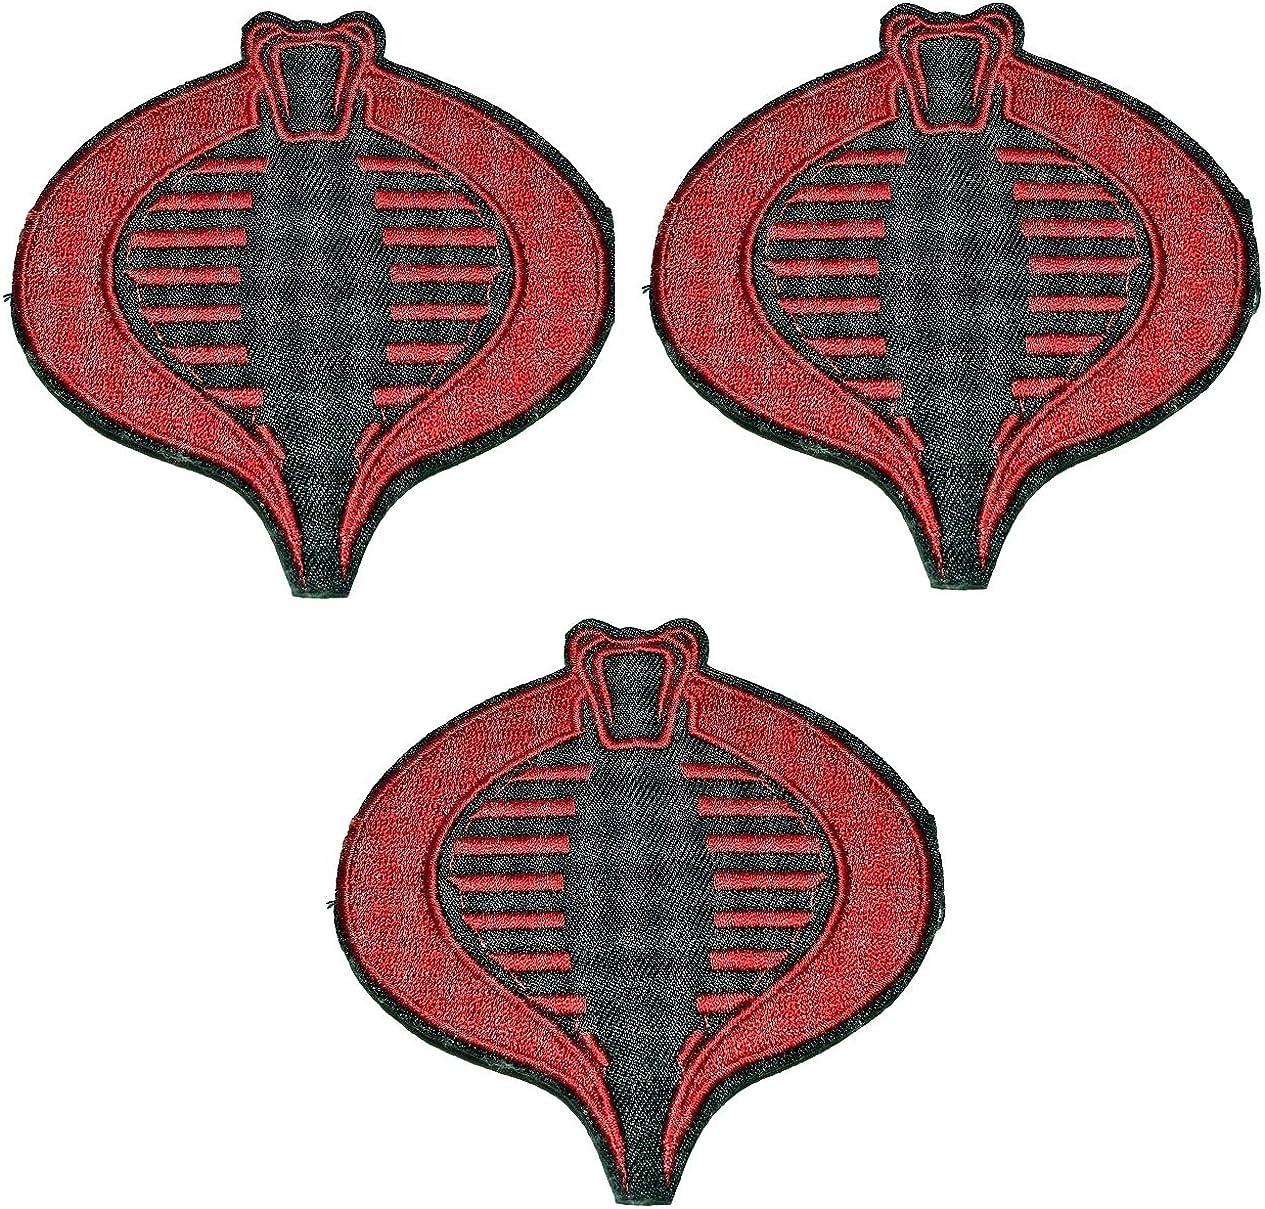 amazon com g i joe red black cobra logo 3 1 2 tall embroidered set of 3 patches clothing gi joe red black cobra logo 3 1 2 tall embroidered set of 3 patches